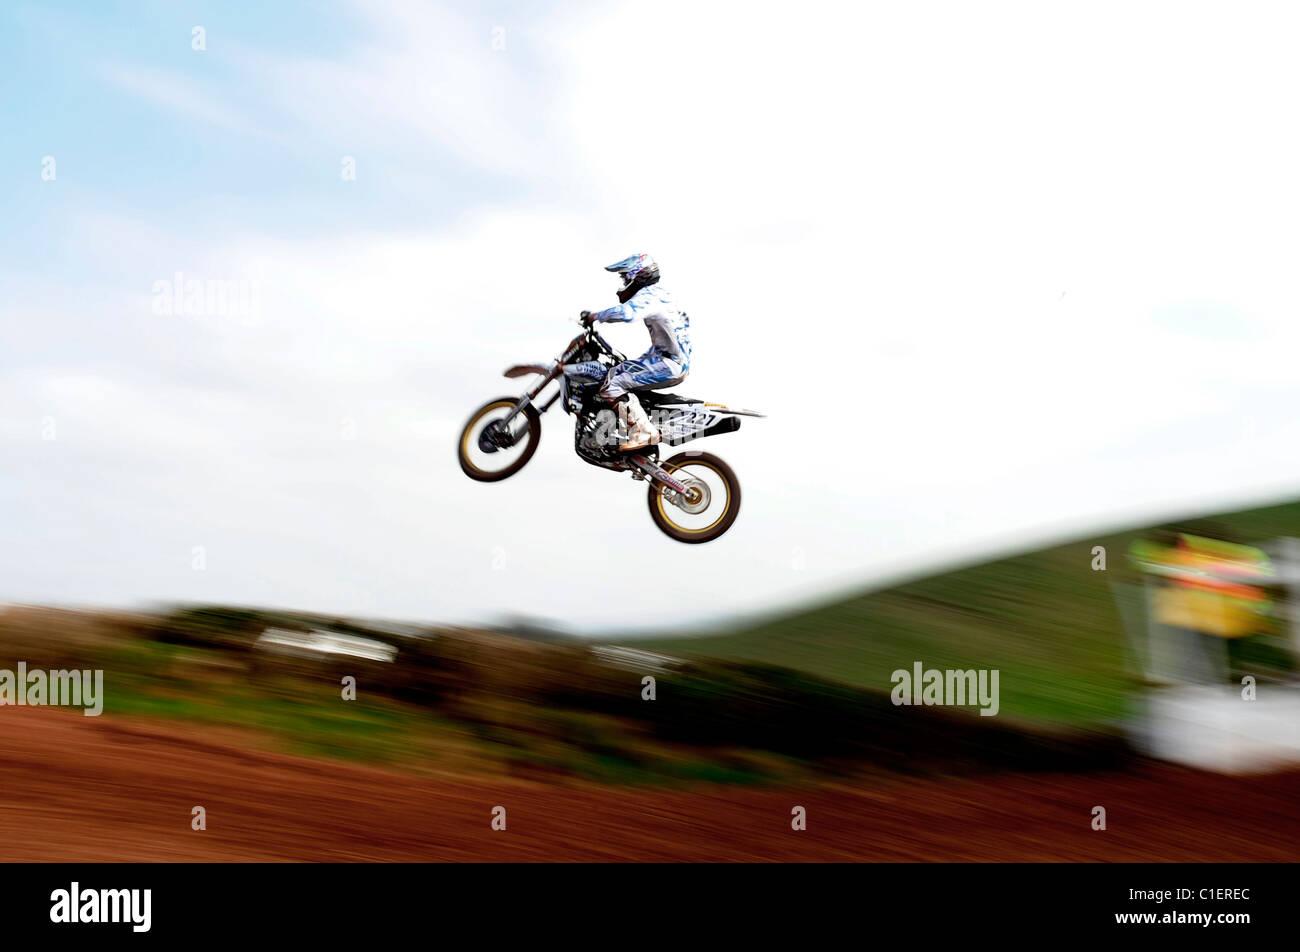 Kristian Whatley - Maxxis British Motocross 2011 - Stock Image